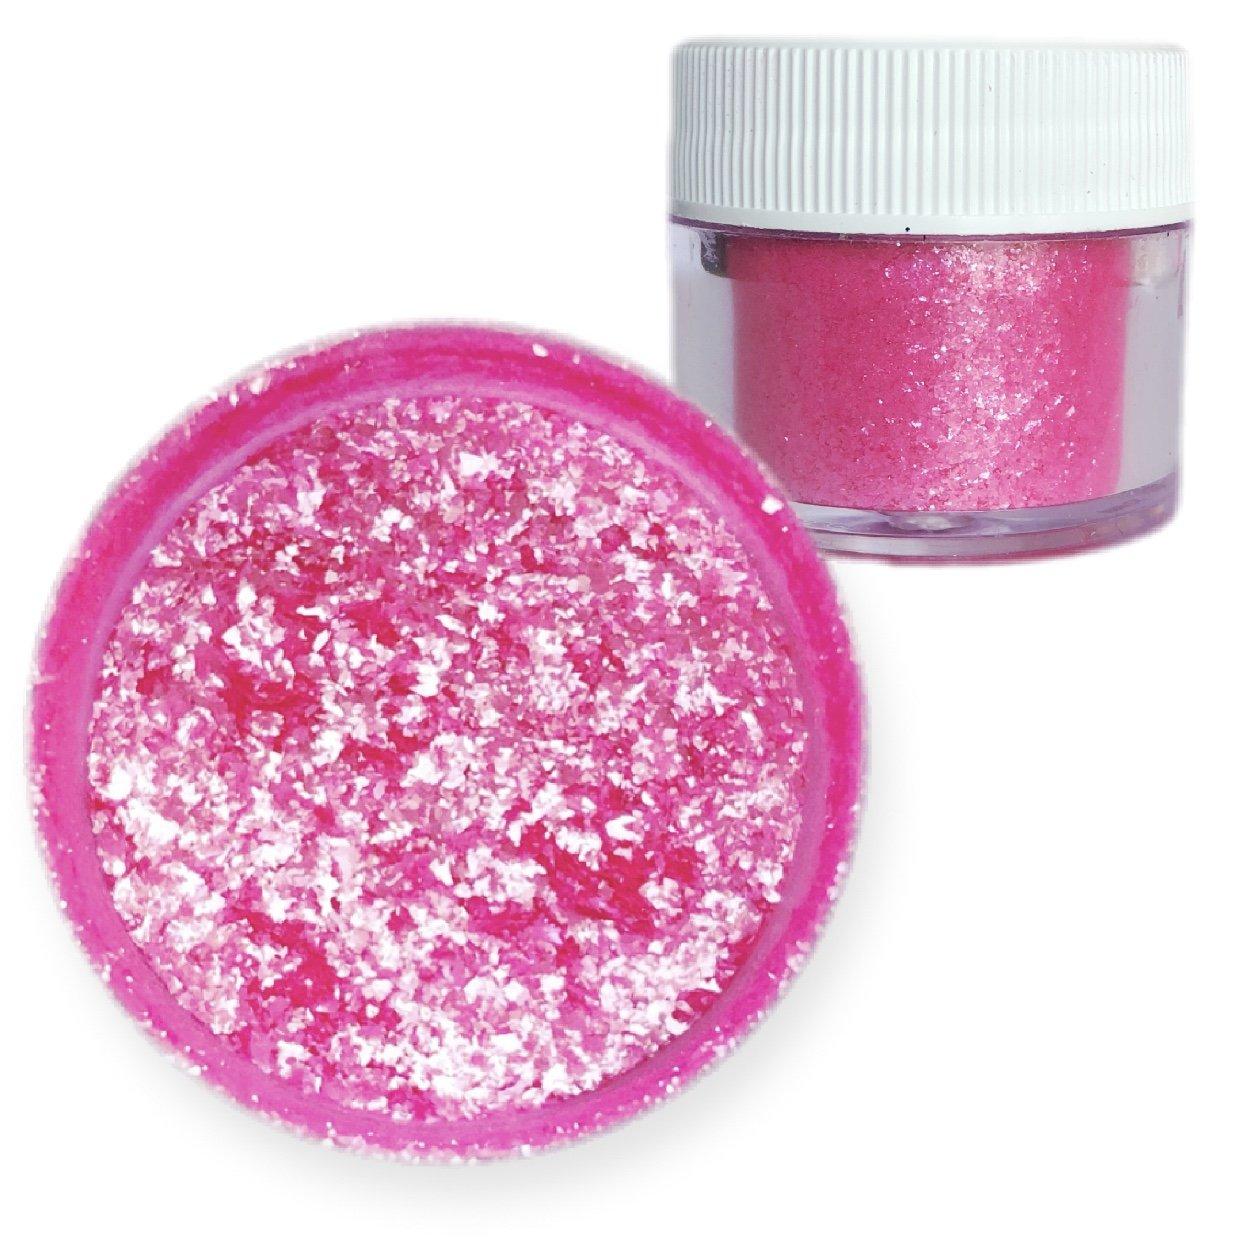 Bulk Size | Deep Pink Edible Tinker Dust Edible Glitter 25g Jar | Bakell Food Grade Gourmet Dessert, Foods, Drink Garnish | Pearlized Shimmer Sparkle Sprinkle by Bakell